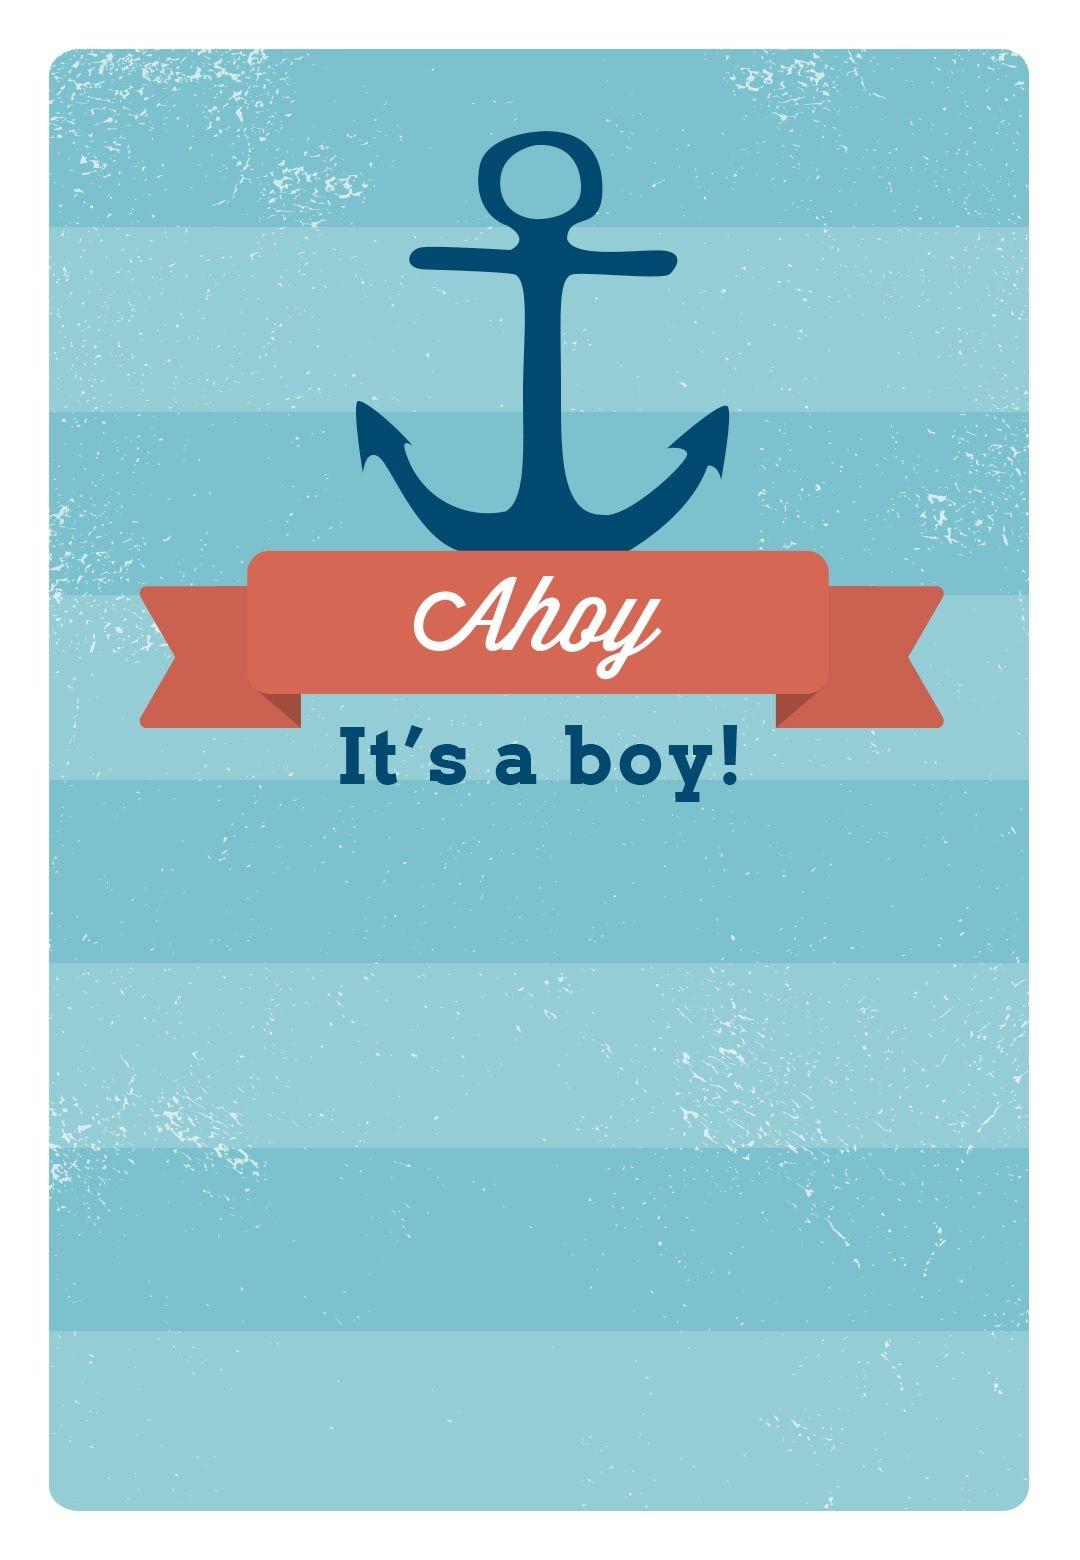 Free Printable Baby Shower Invitation - Ahoy It's A Boy | Greetings - Free Printable Blank Baby Shower Invitations